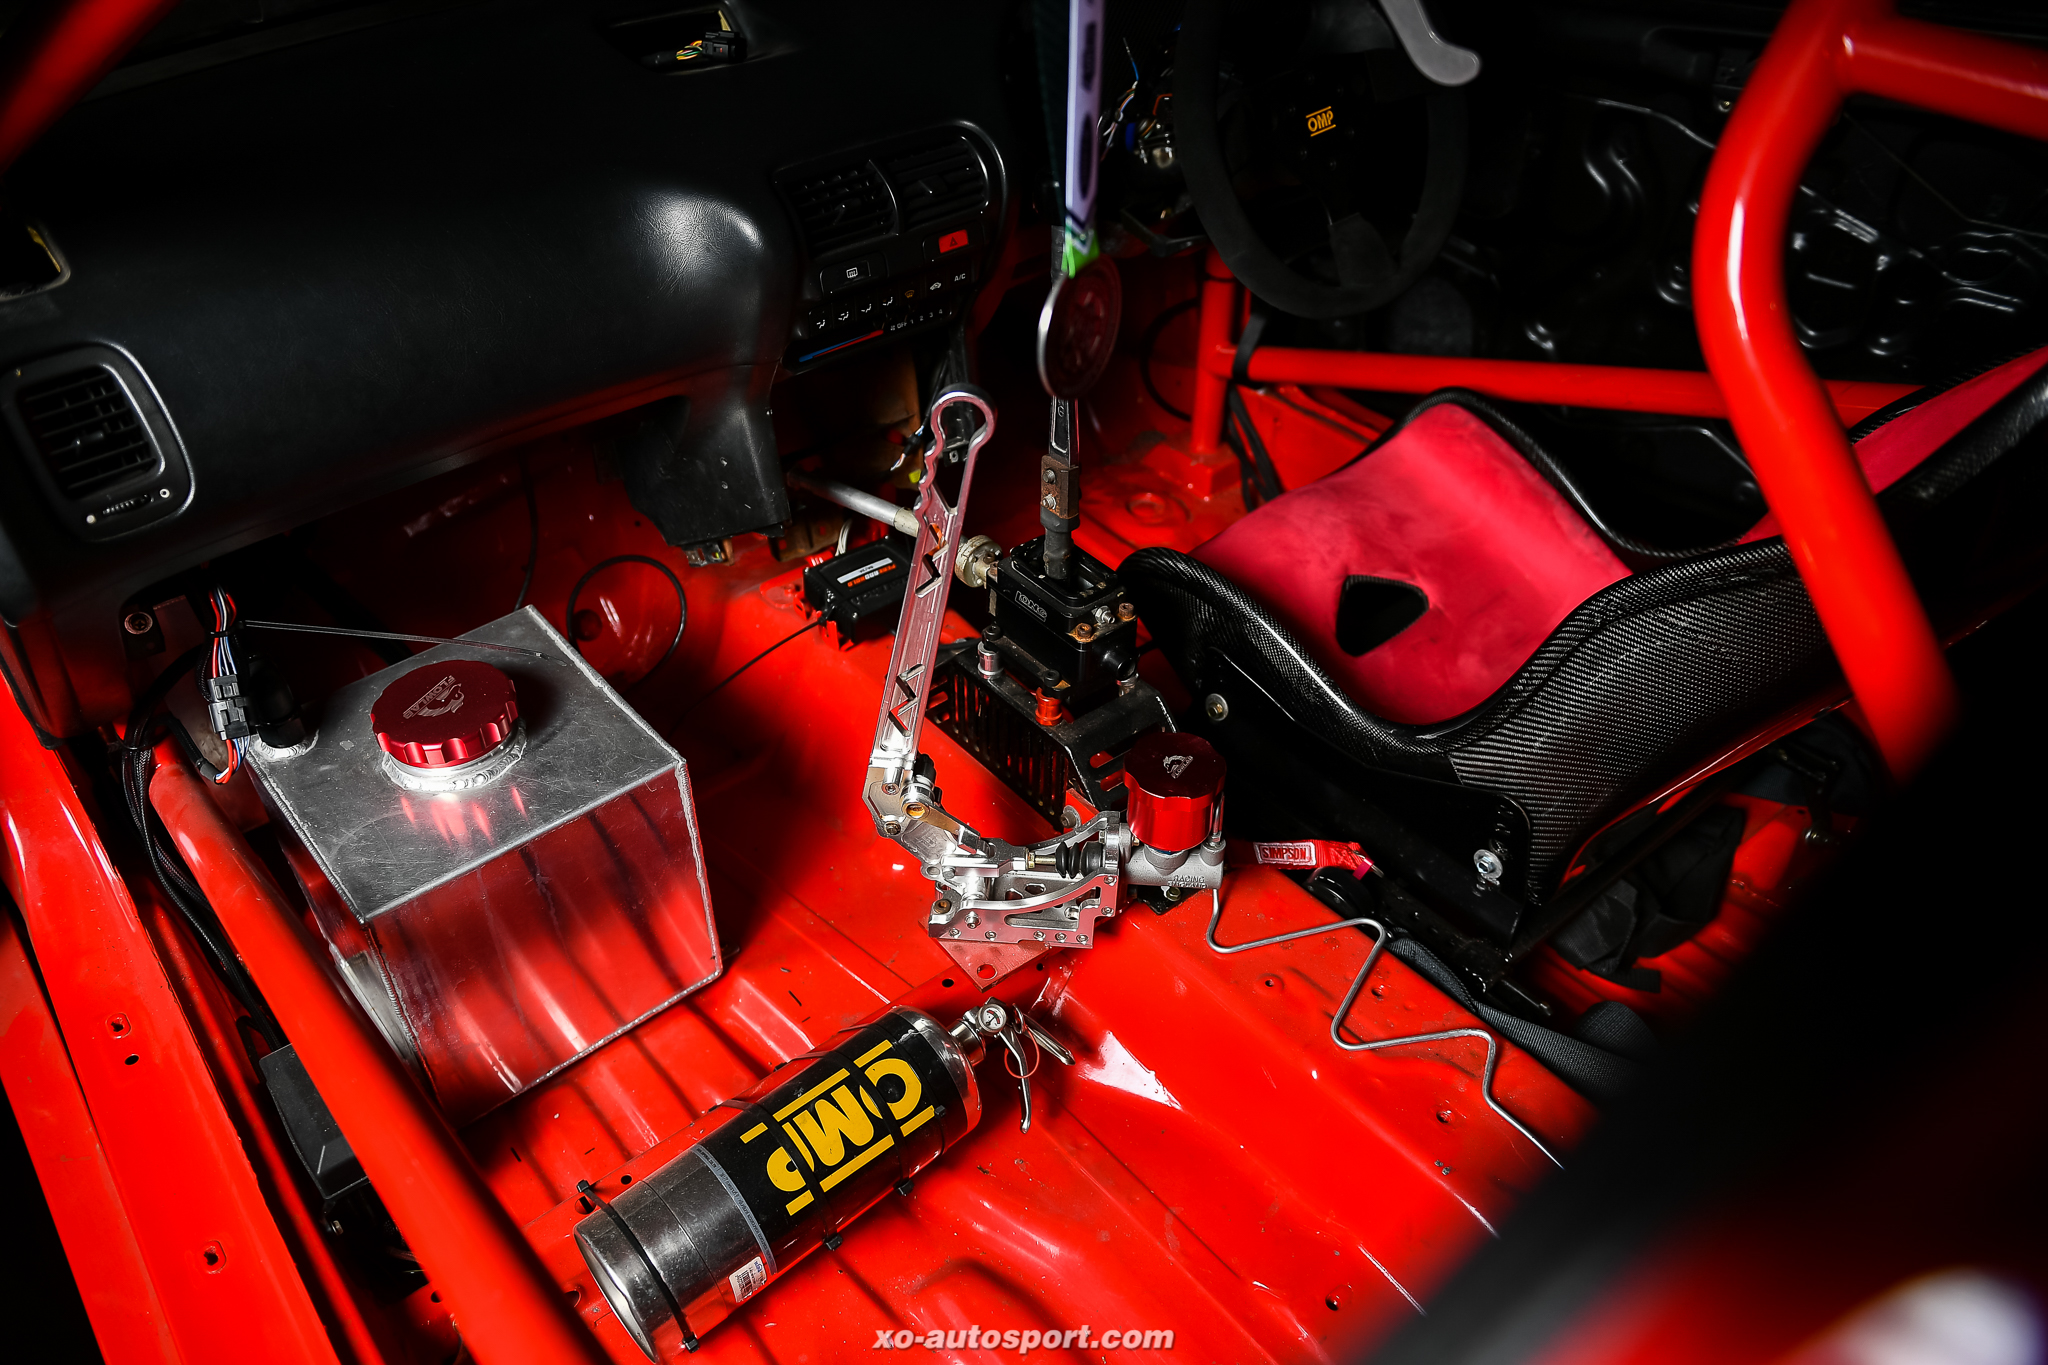 INTEGRA DC2 PRO 4 FWD Champion by FLOW LAB CNC 17